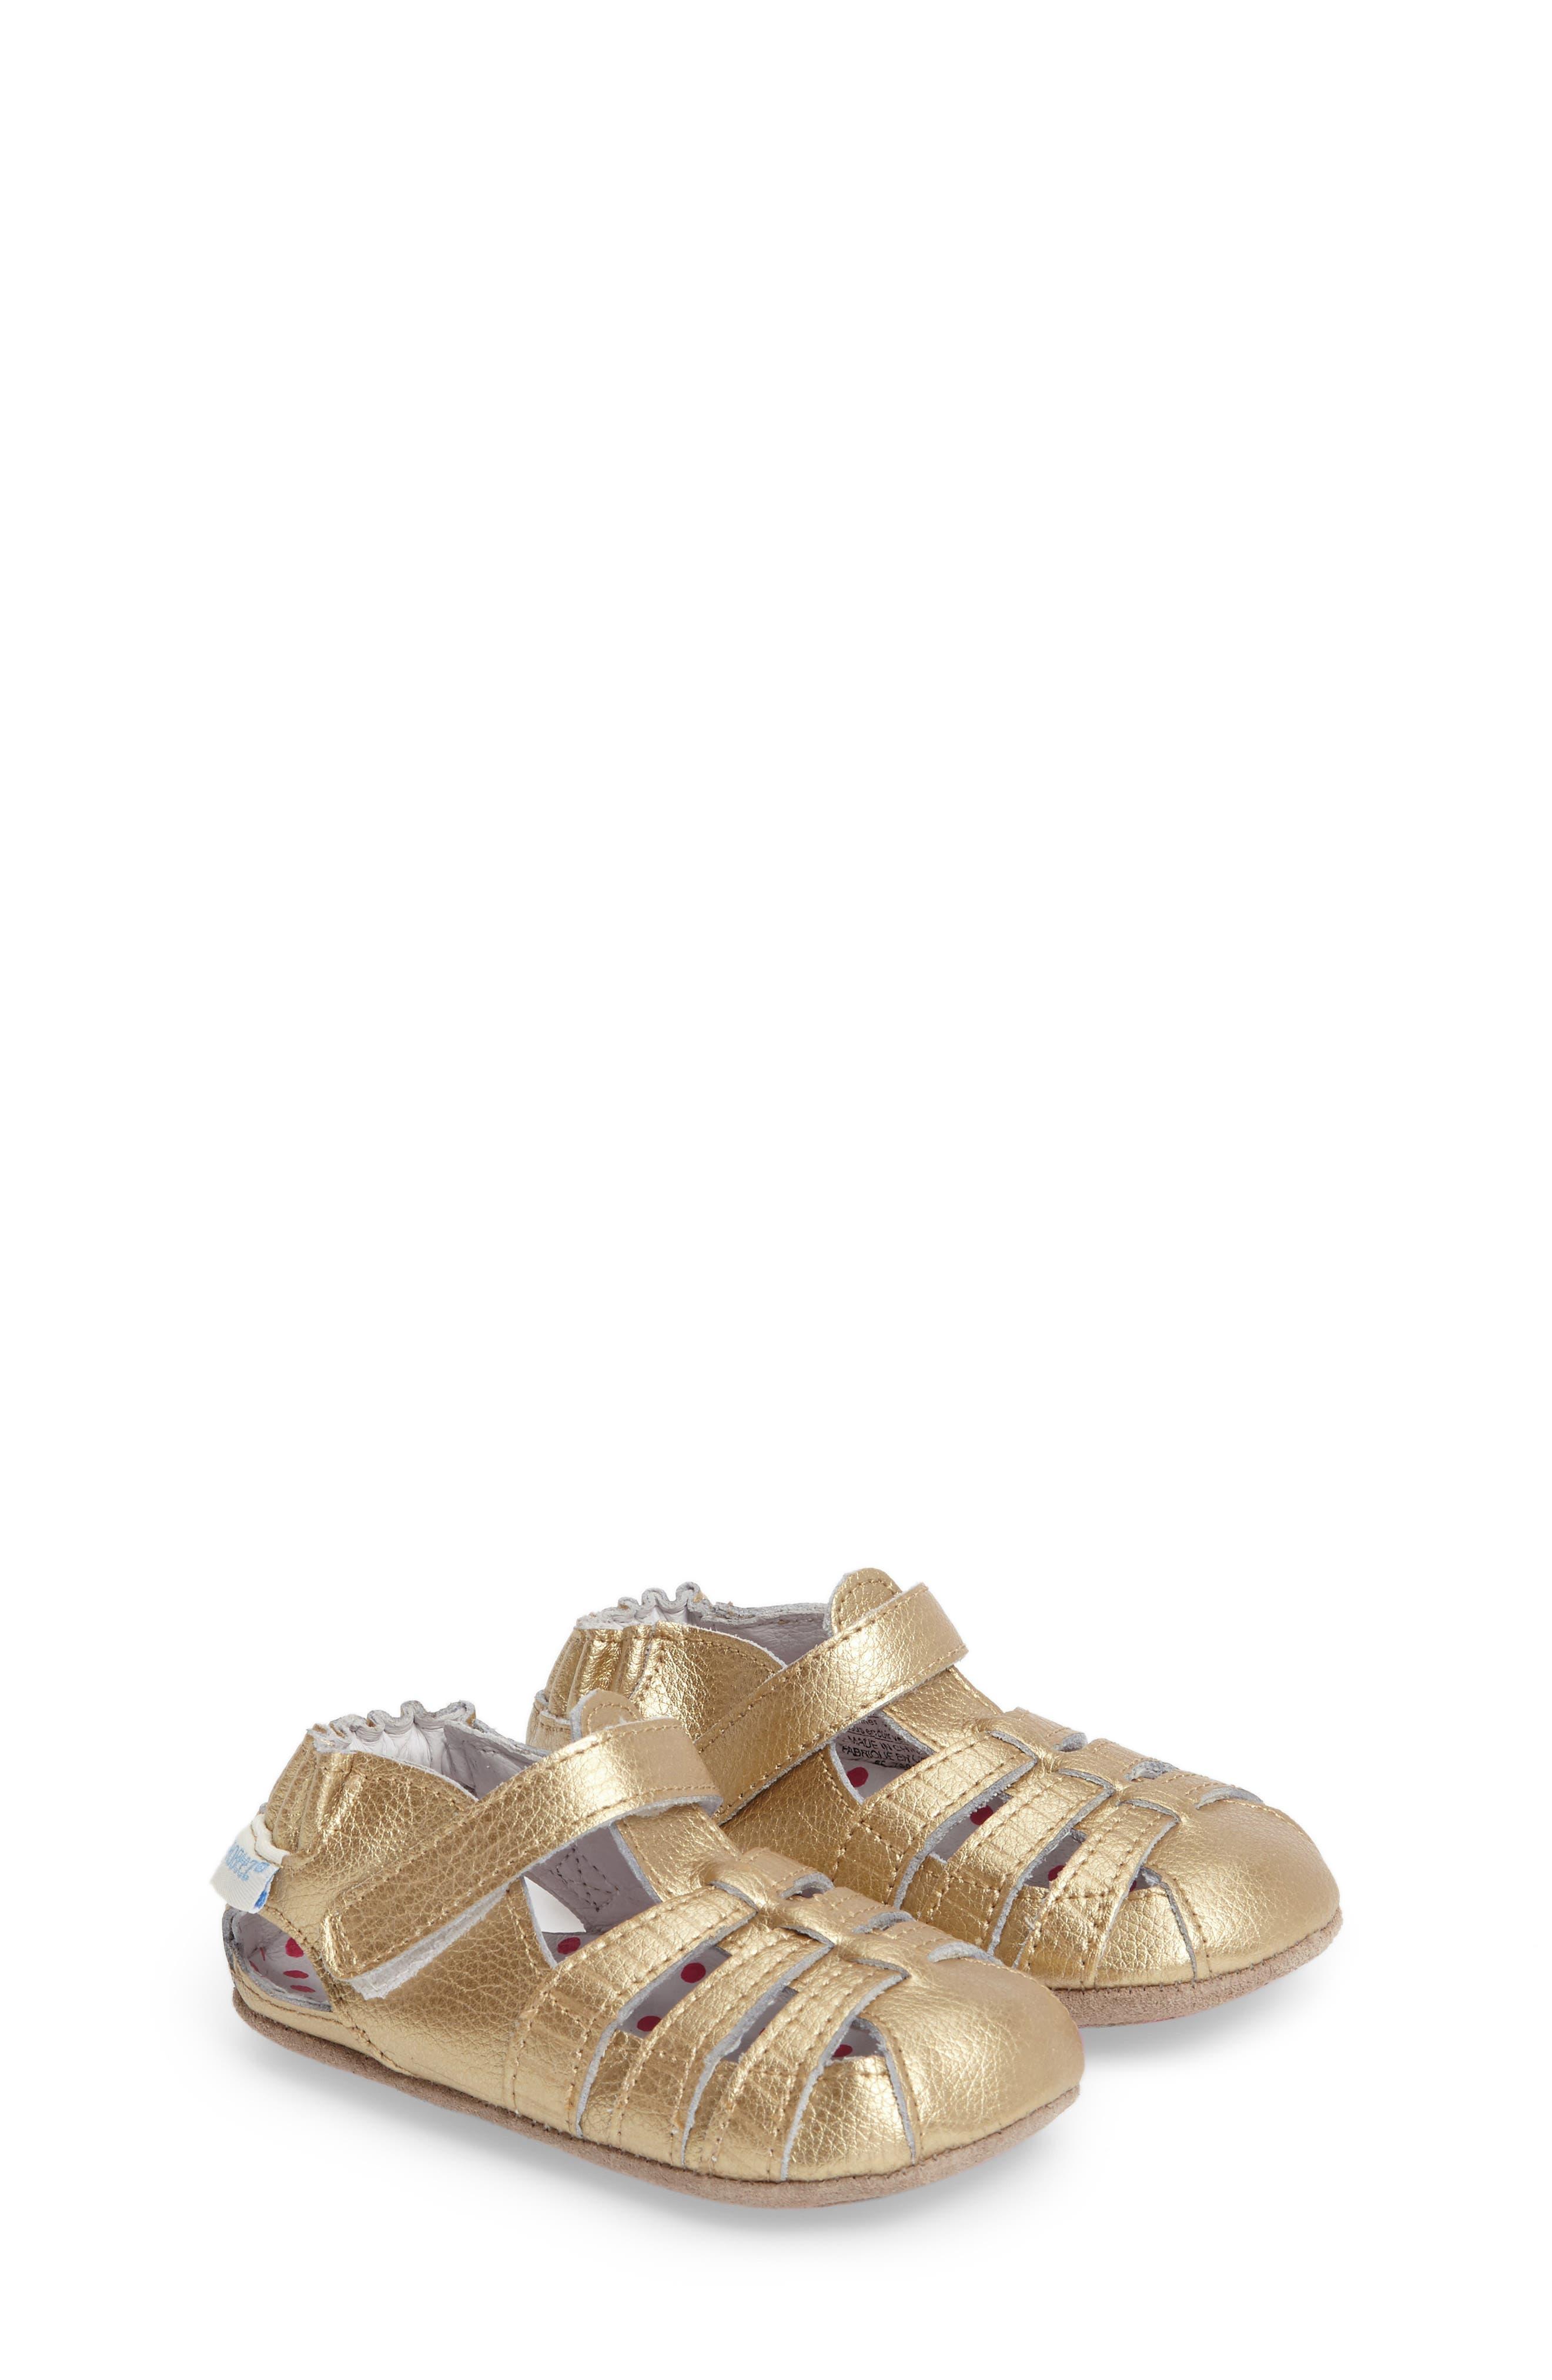 Paris Crib Shoe,                             Main thumbnail 1, color,                             GOLD